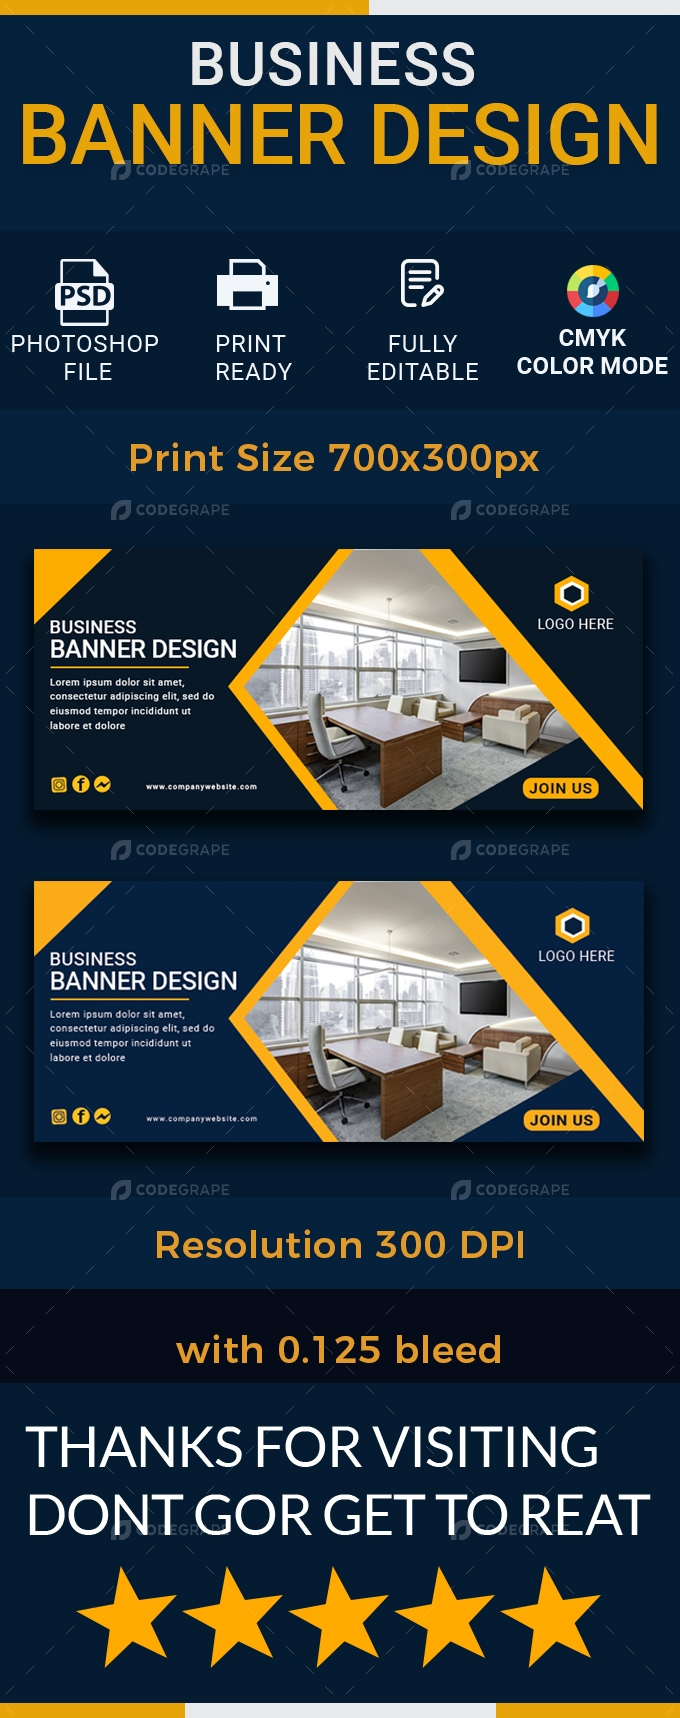 Business Banner Design Template